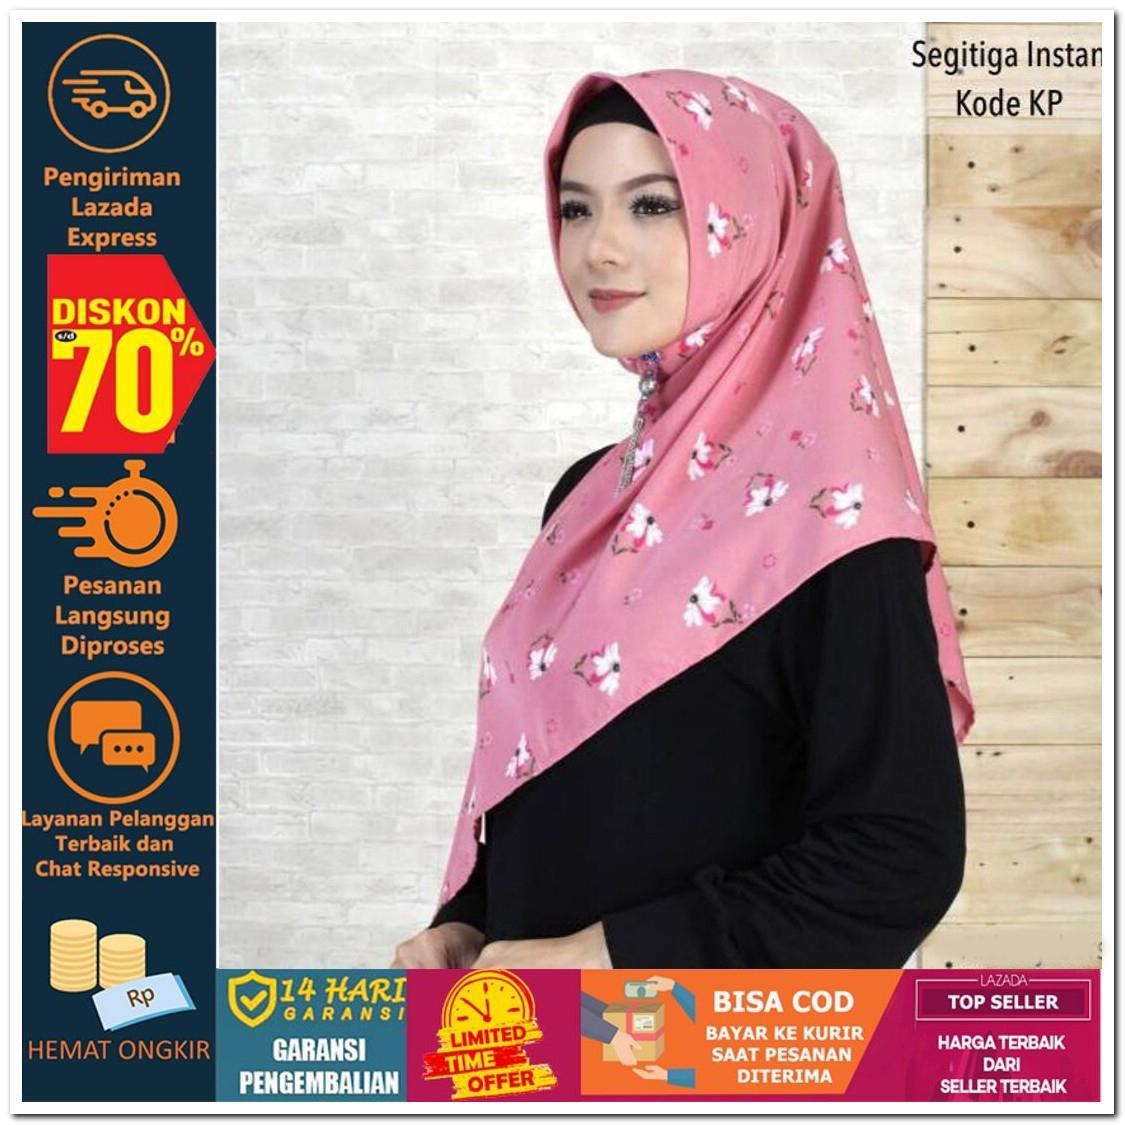 Totally Great Shop JILBAB SEGITIGA INSTAN KODE KN KP KL KM Hijab Jilbab Segi Empat Square Pashmina Kerudung Khimar Pesta Kondangan Nikahan Simple Pet Instan Instant Bergo Kekinian Trendy